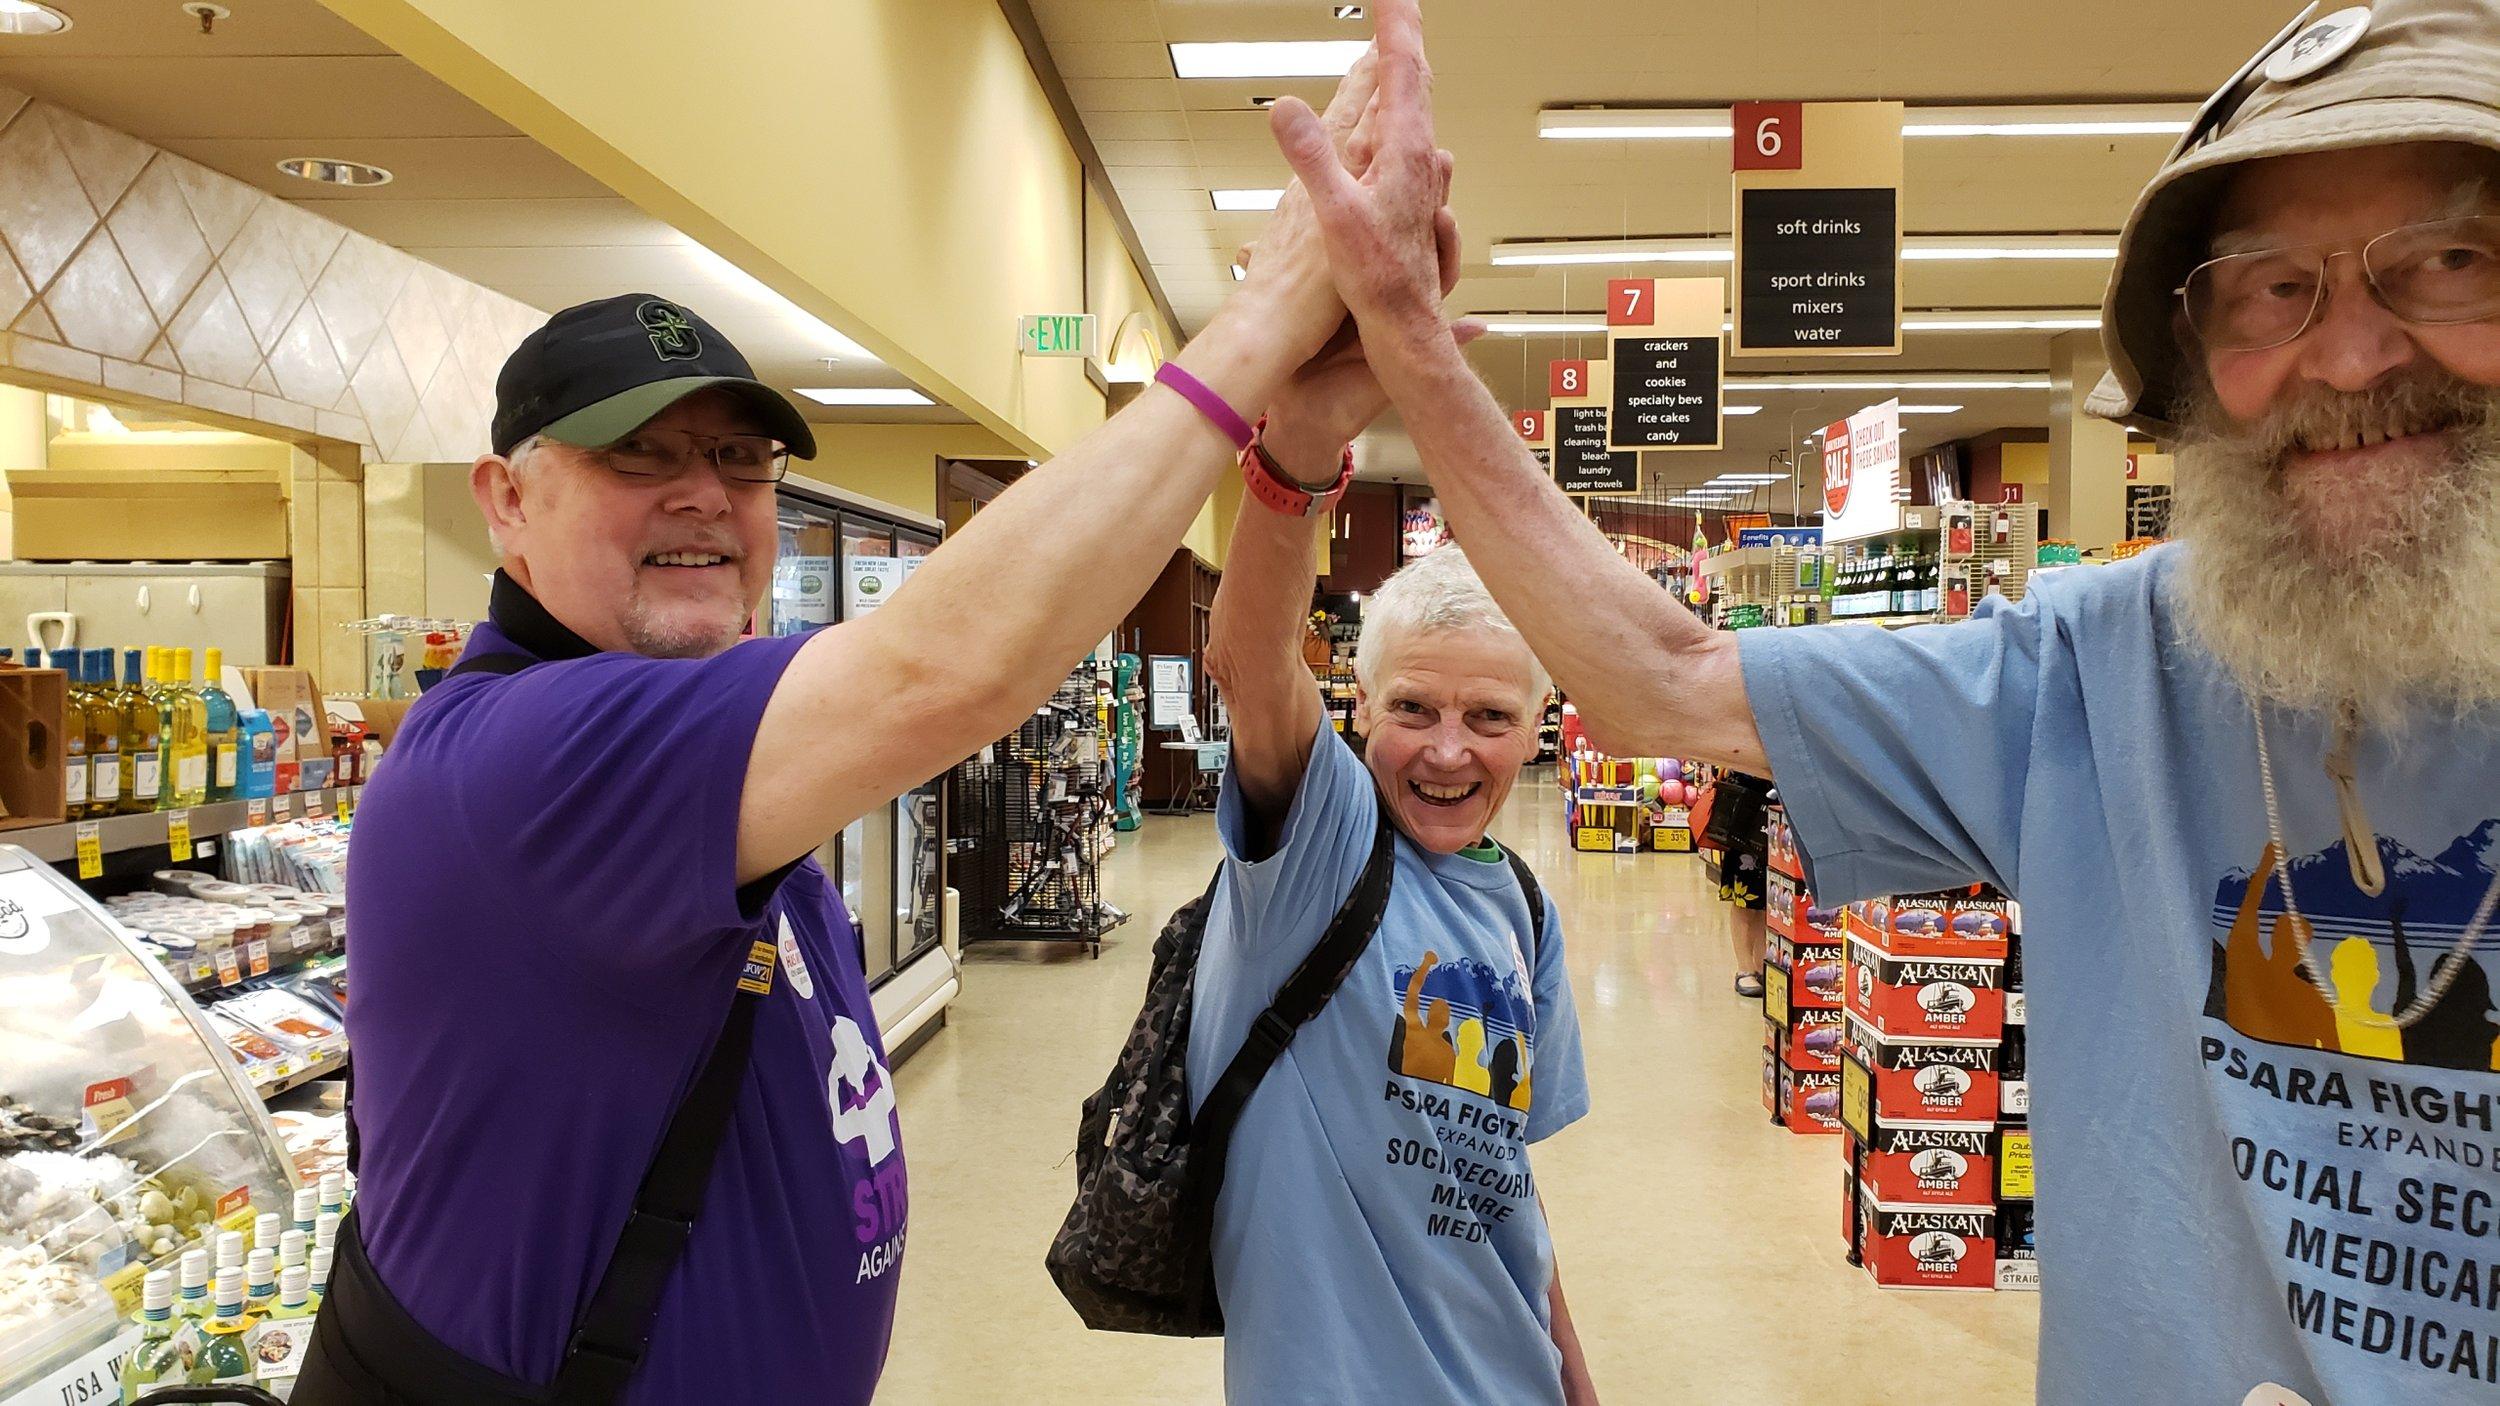 Pinehurst Safeway community worker high five 2.jpg